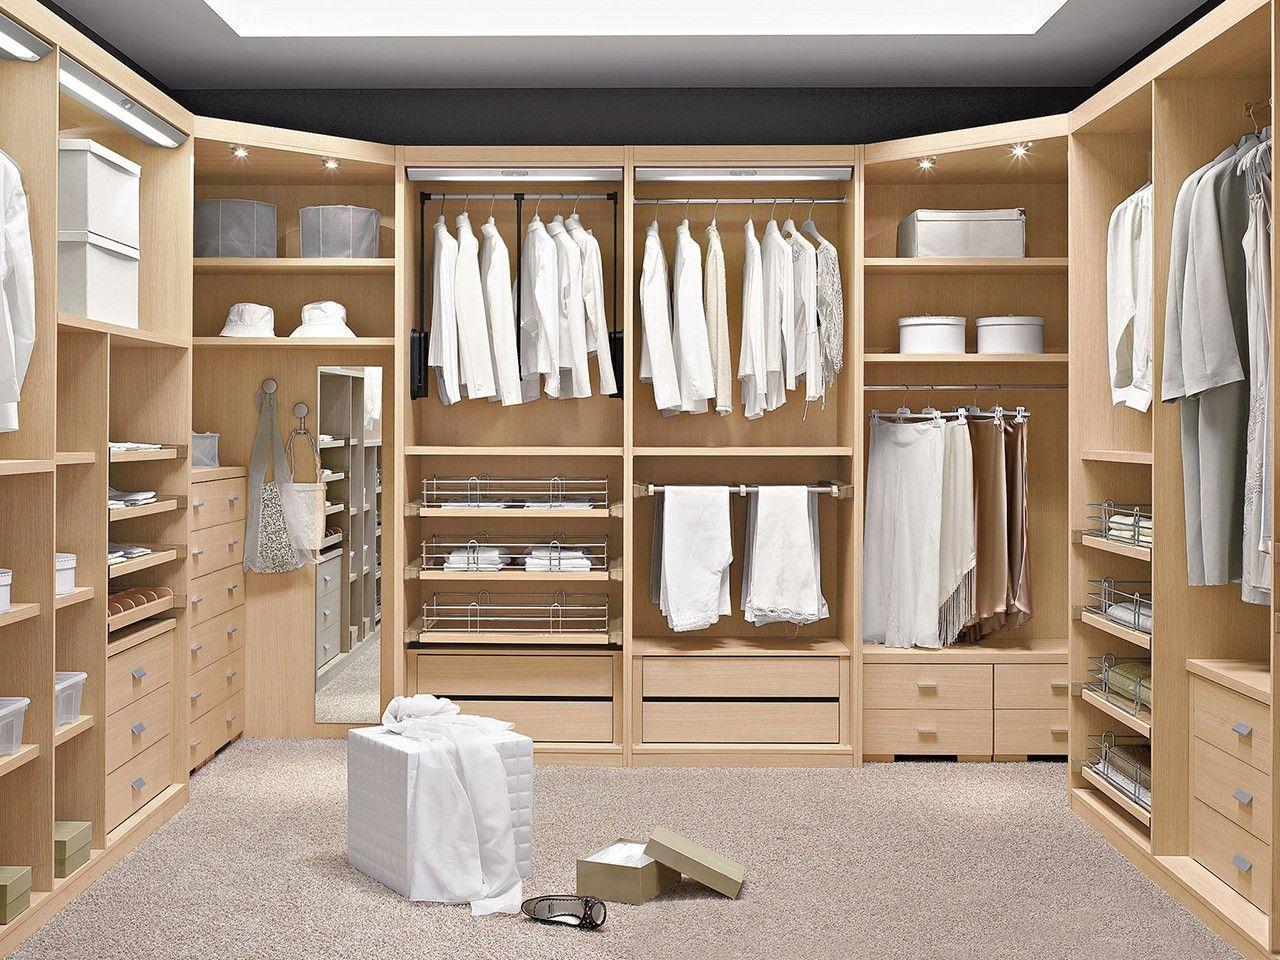 Rinconero giratorio vestidor buscar con google home for Closet habitaciones modernas